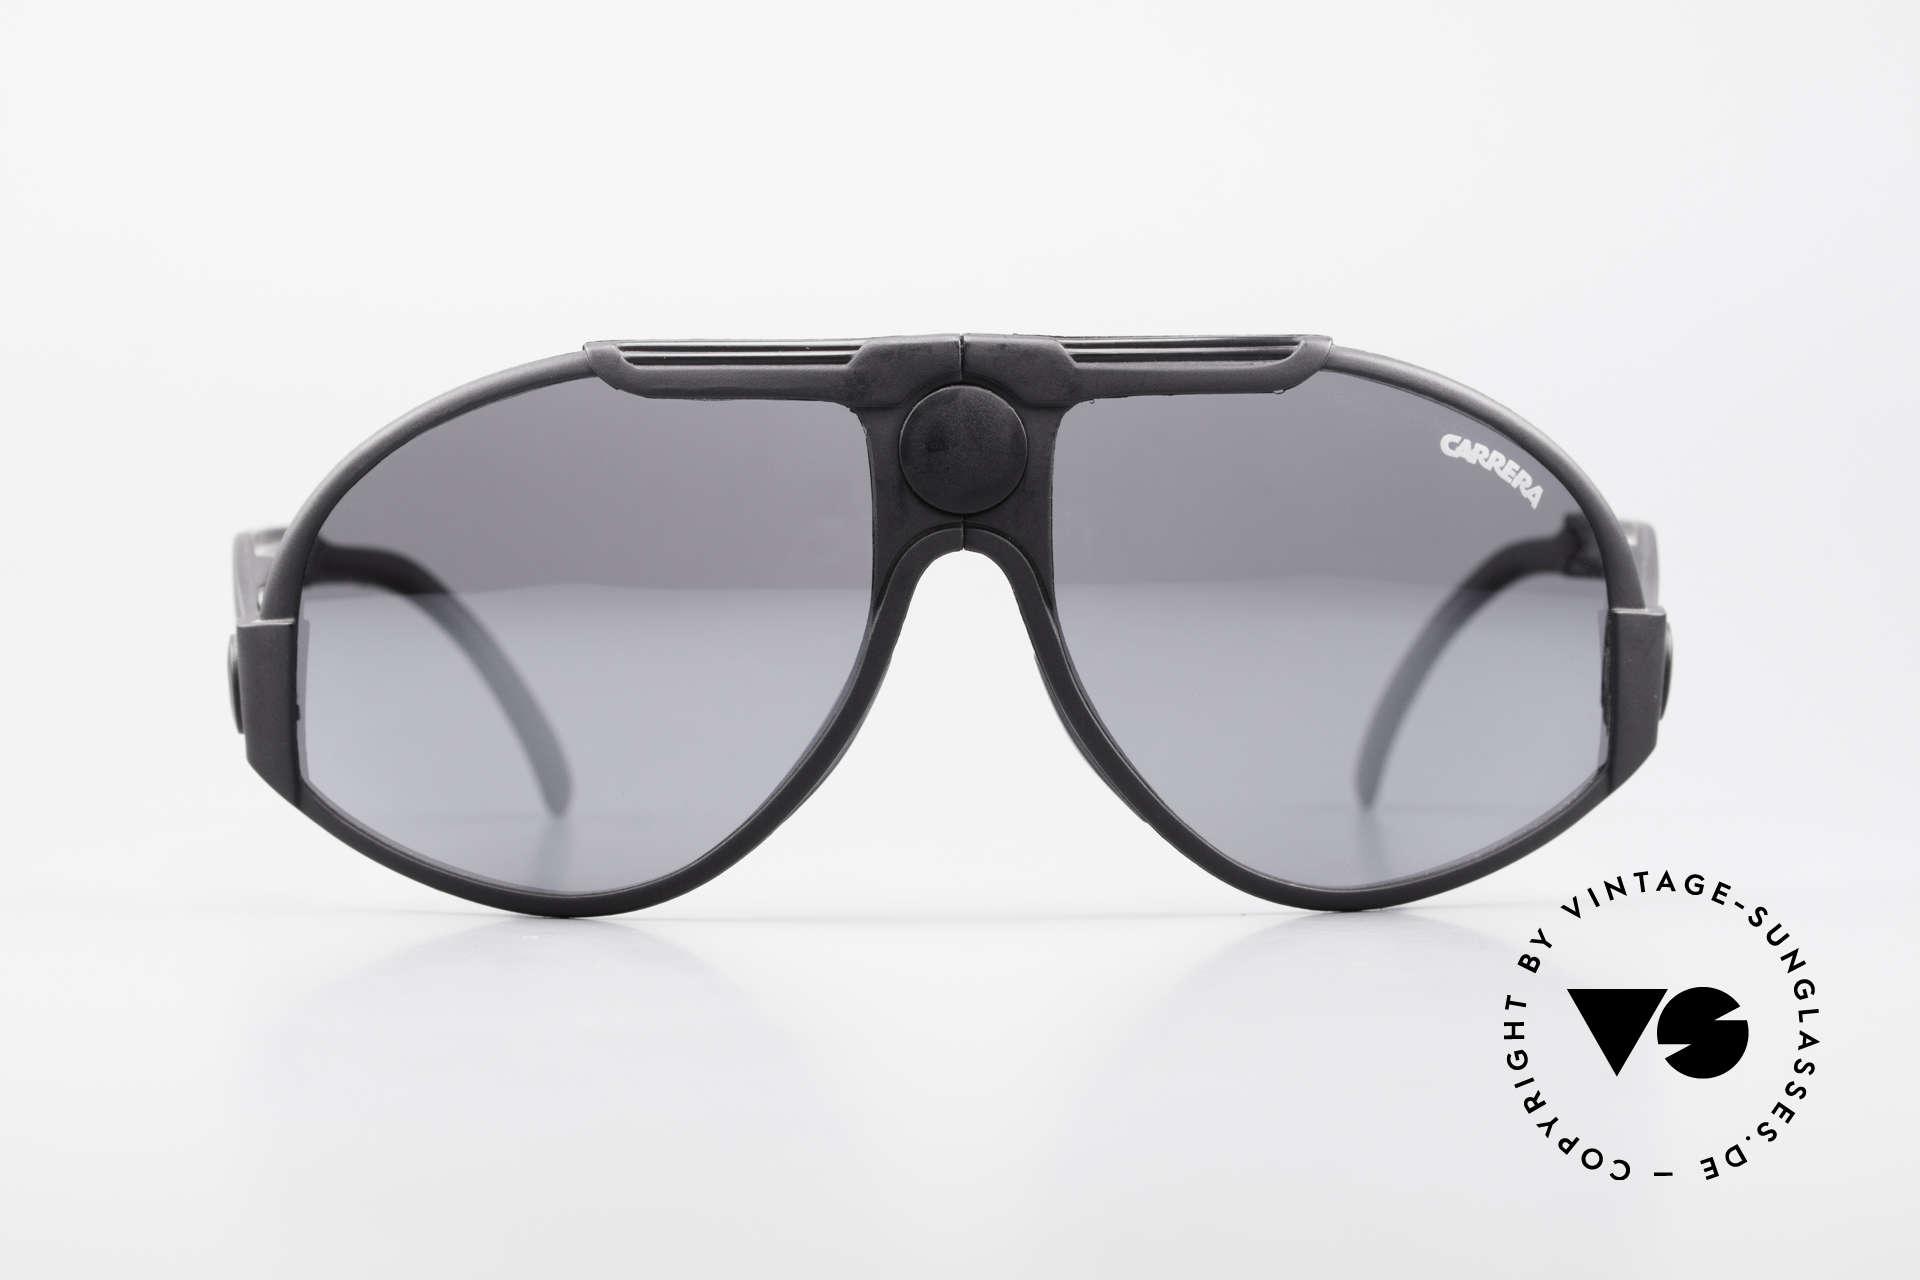 Carrera 5586 Folding Kevlar Sunglasses 90s, lightweight (25 gram only) & hard-wearing (Kevlar), Made for Men